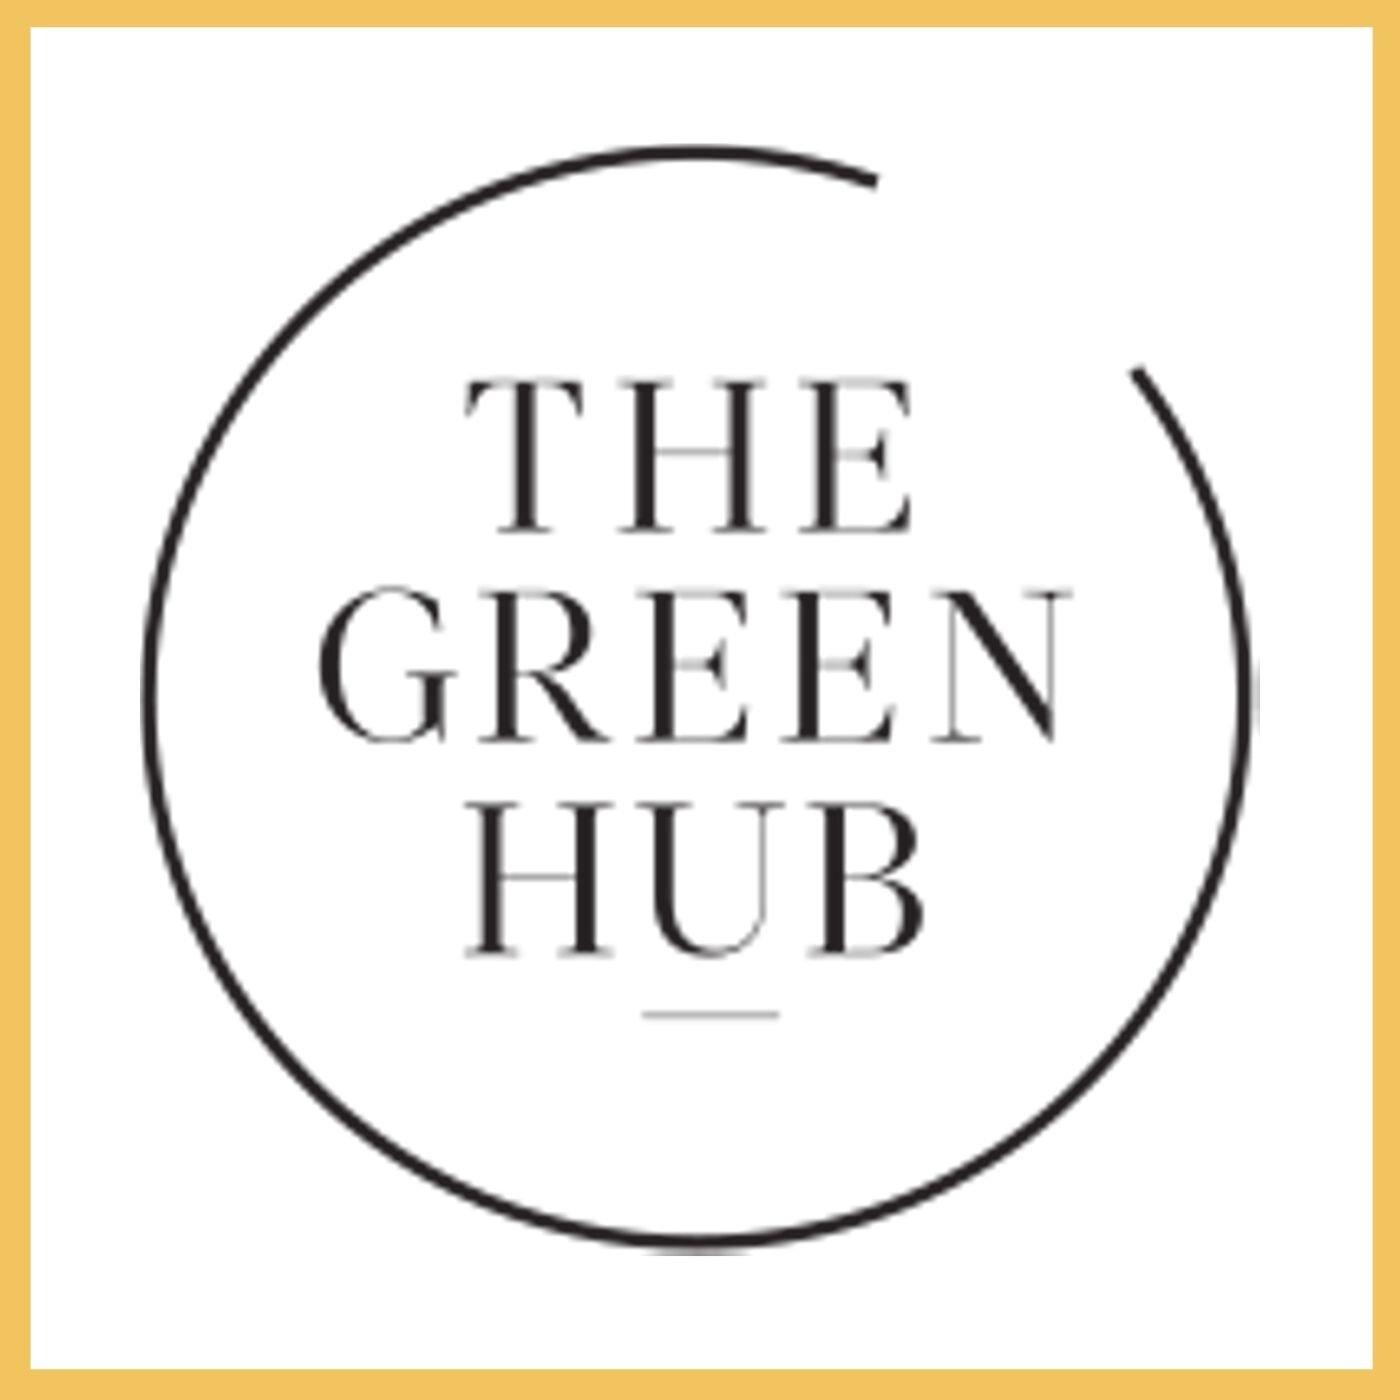 The Green Hub logo